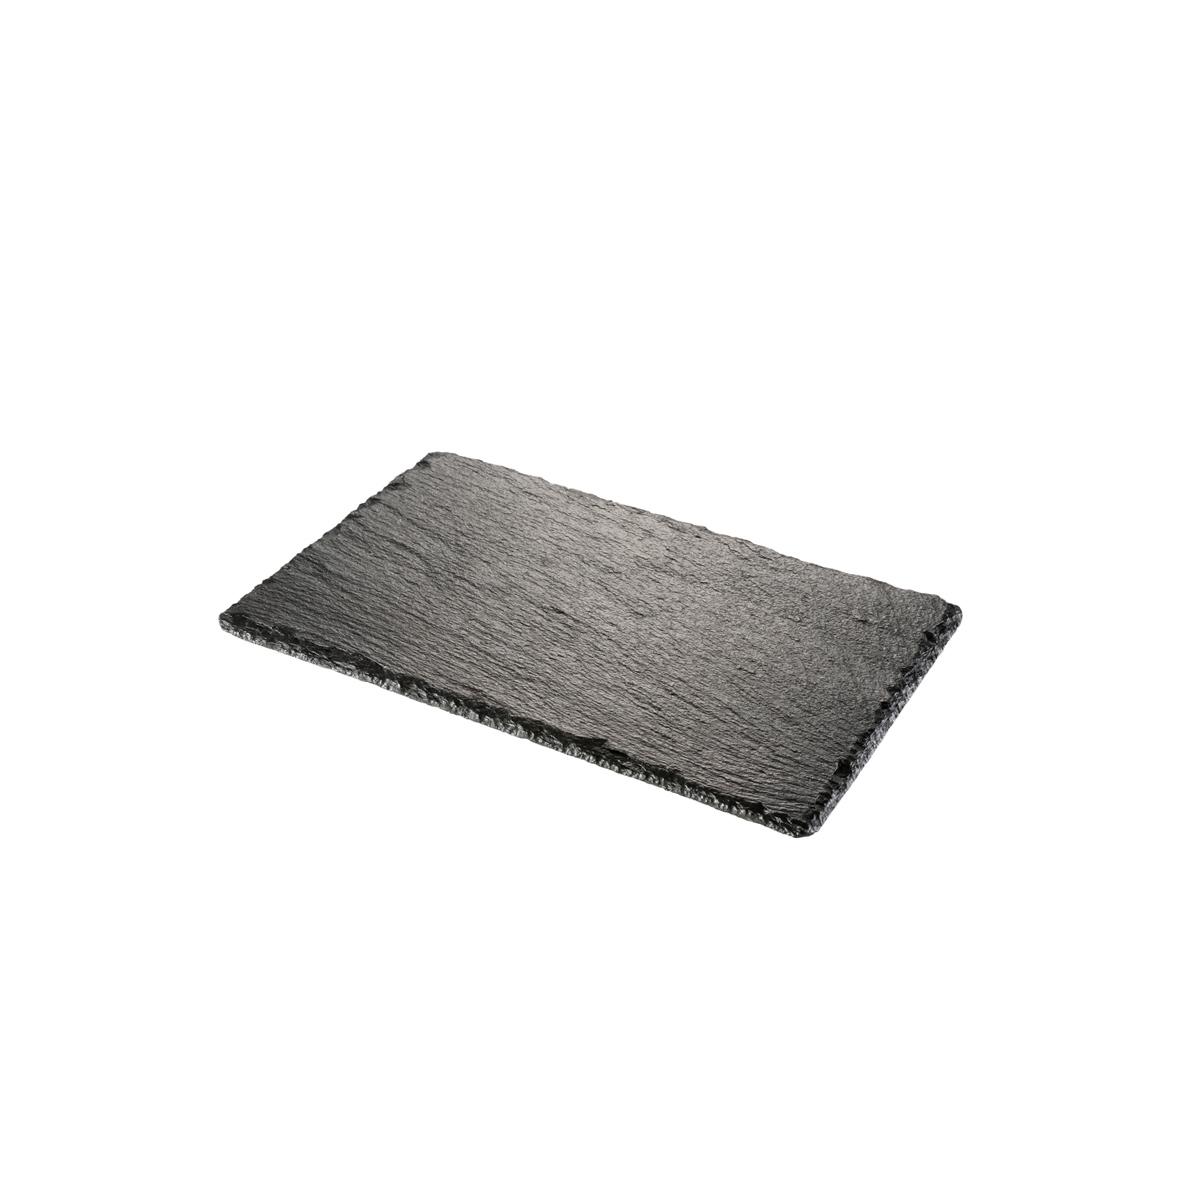 Servírovací deska GrandCHEF 21 x 14 cm